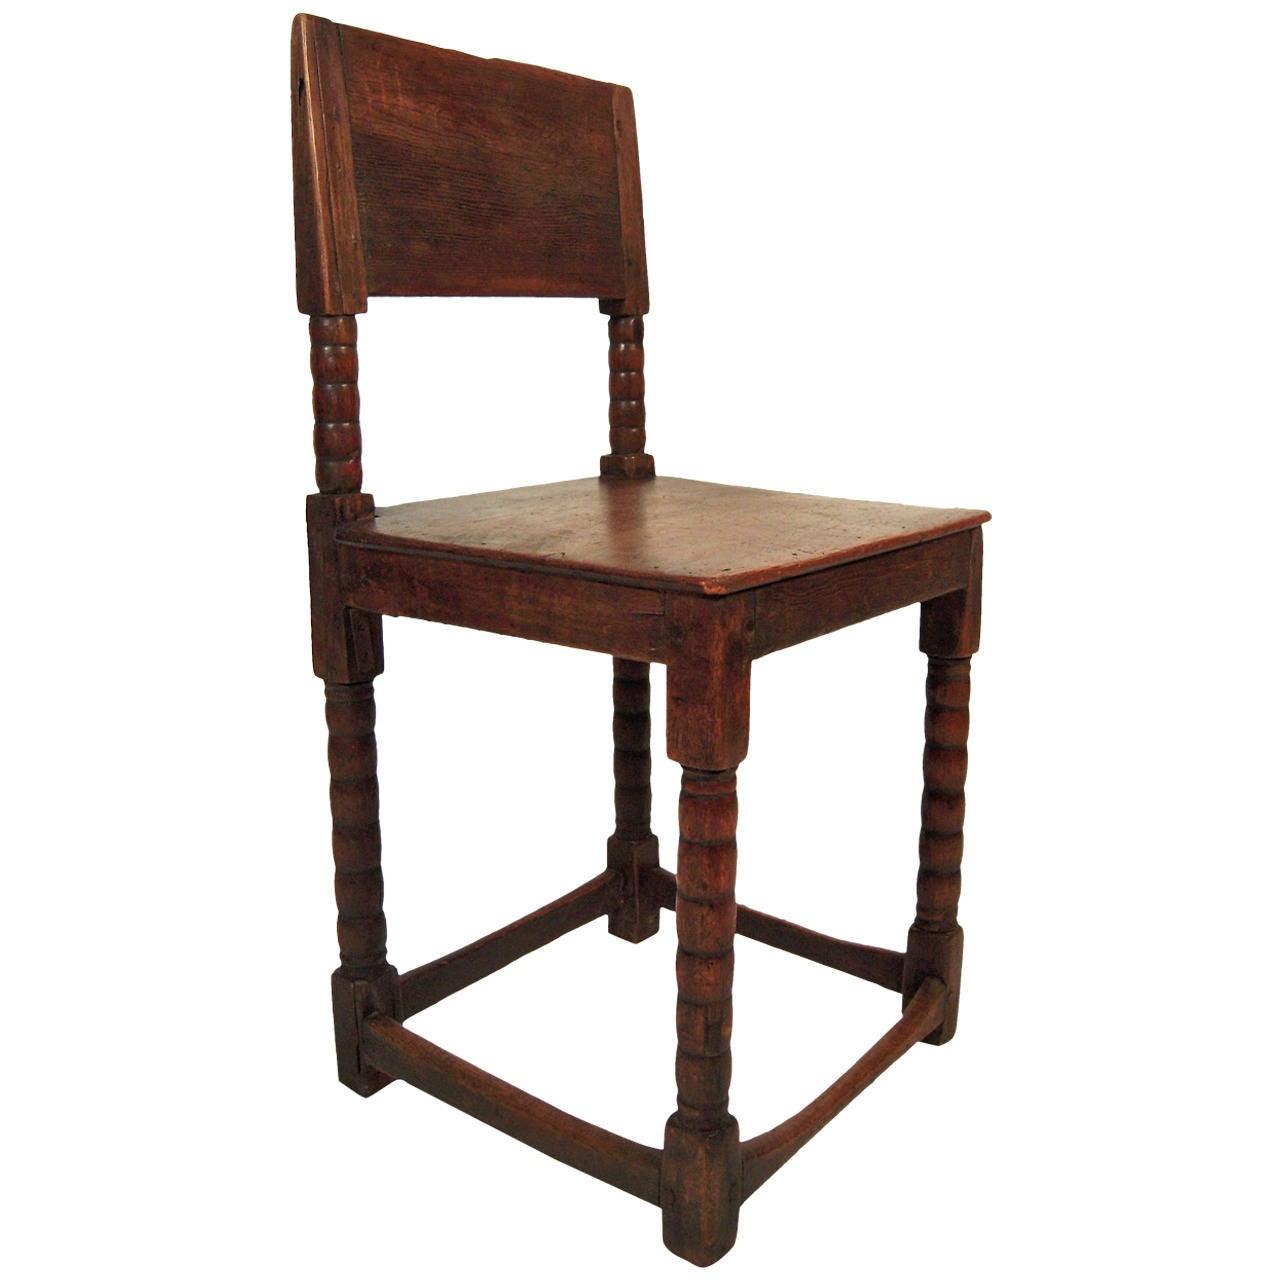 English style furniture unique home design for English chair design